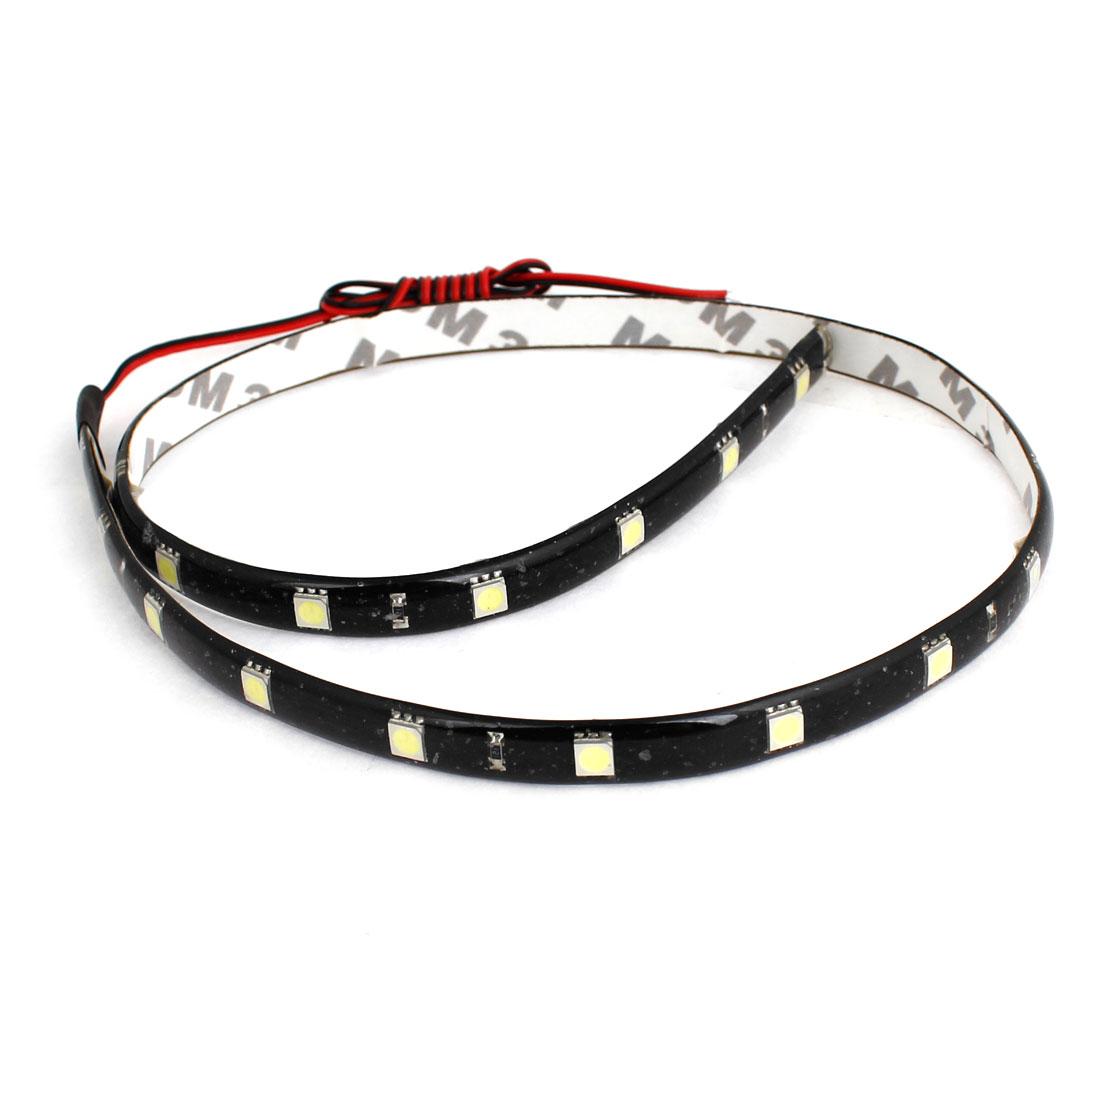 2 Pcs White 24 LED 5050 SMD Lamp String Waterproof Auto Strip Light 60cm